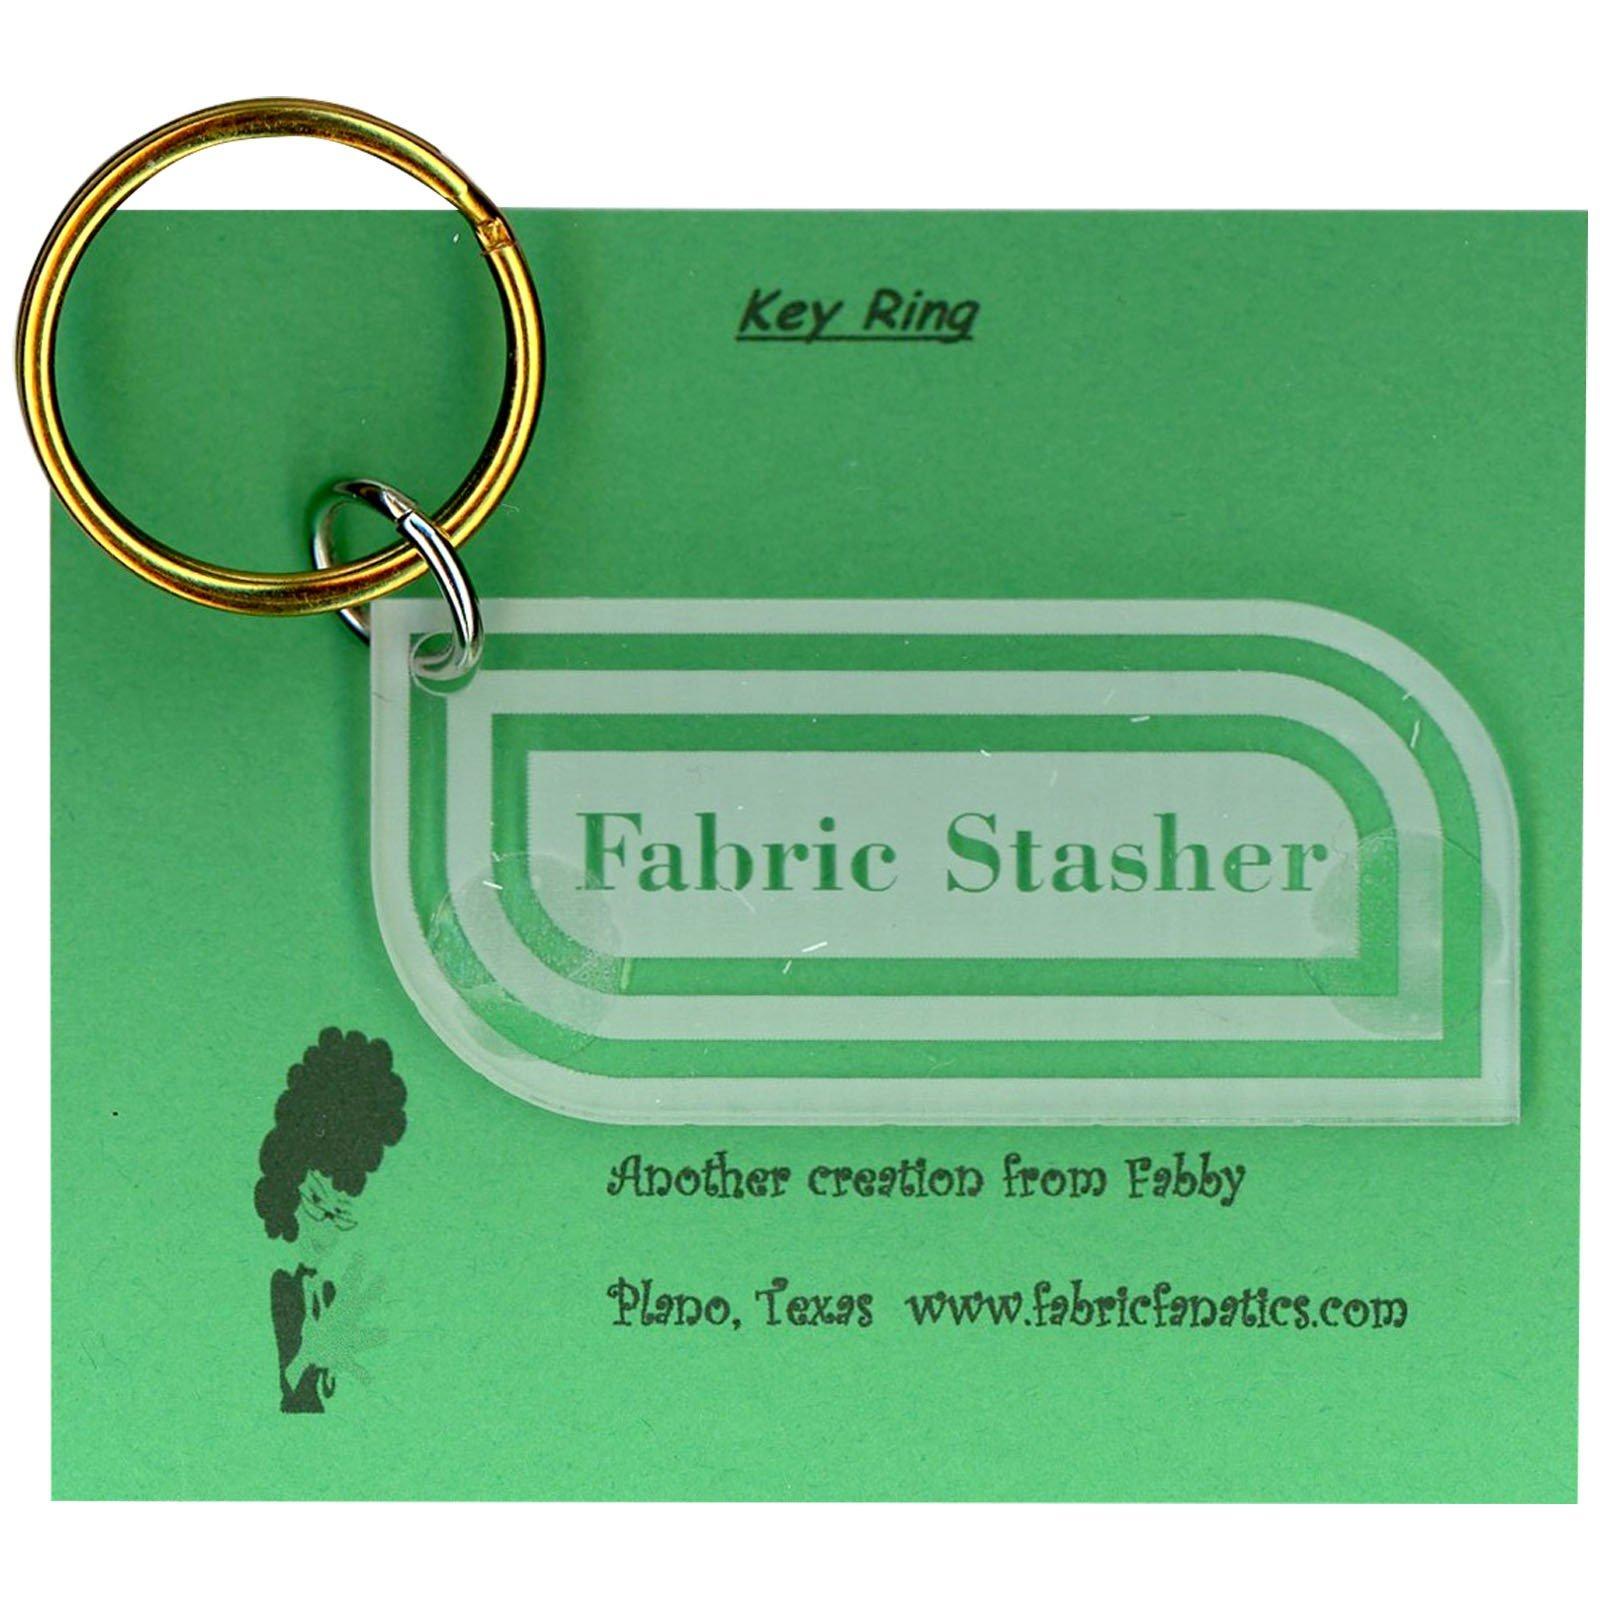 KEYRING FABRIC STASHER